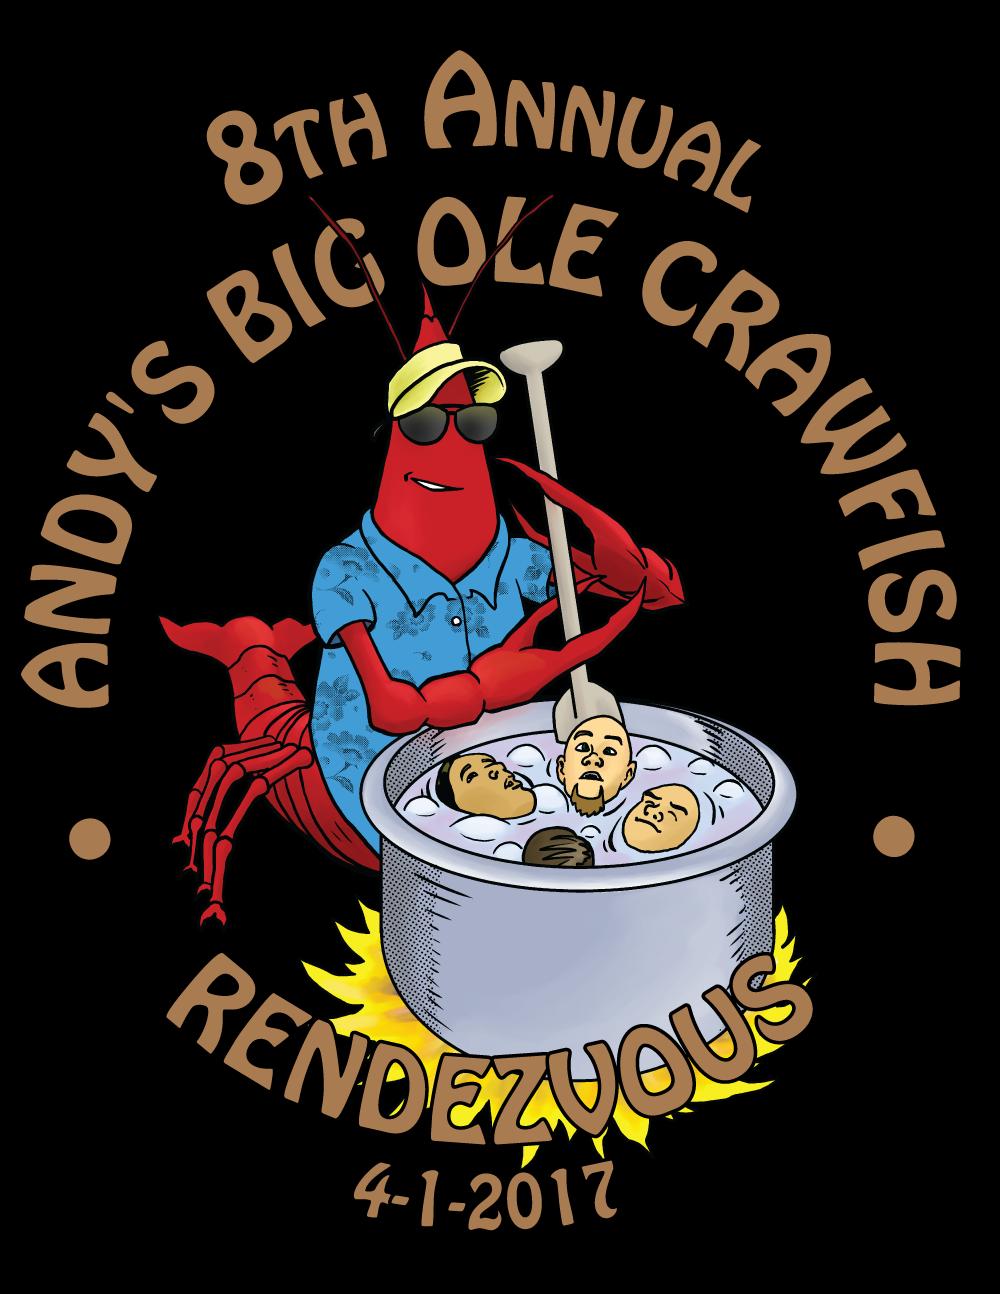 Crawfish clipart svg. Rendezvous artsmith studios